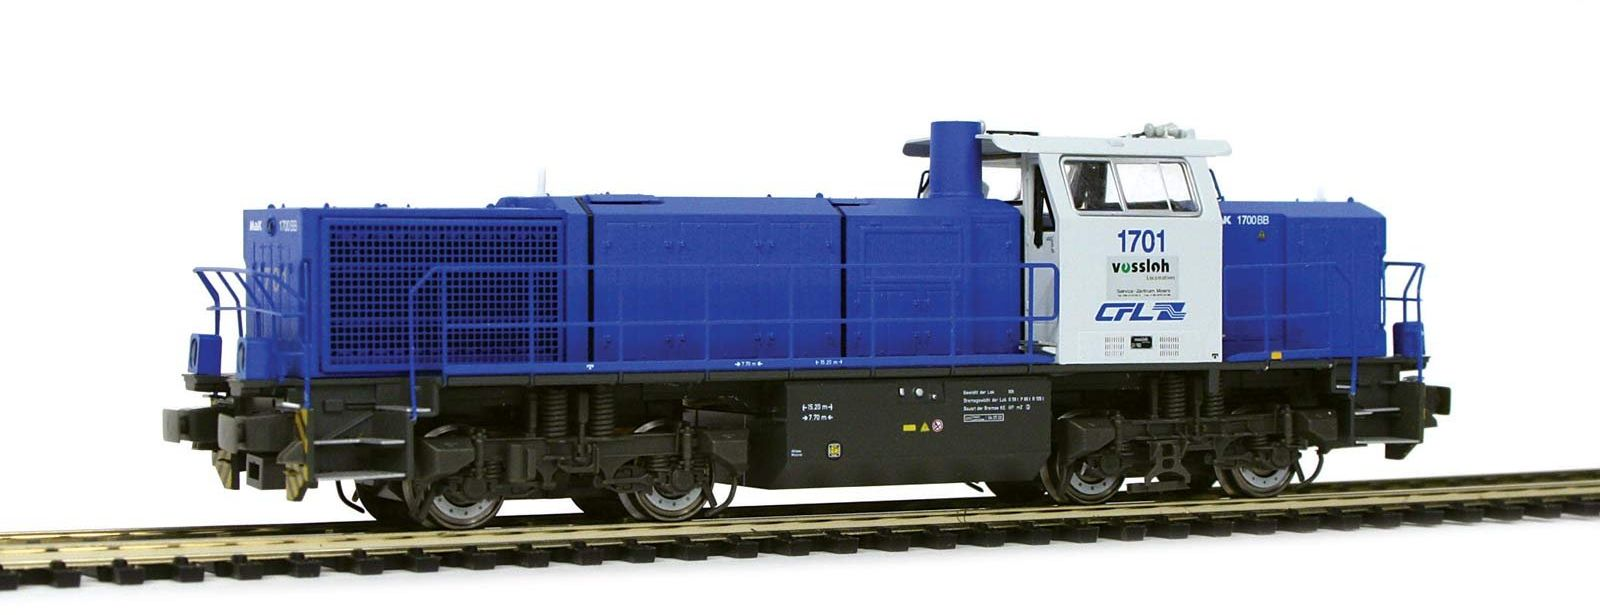 MEHANO T860 G1700 CFL-AC DIGITAL pojazd